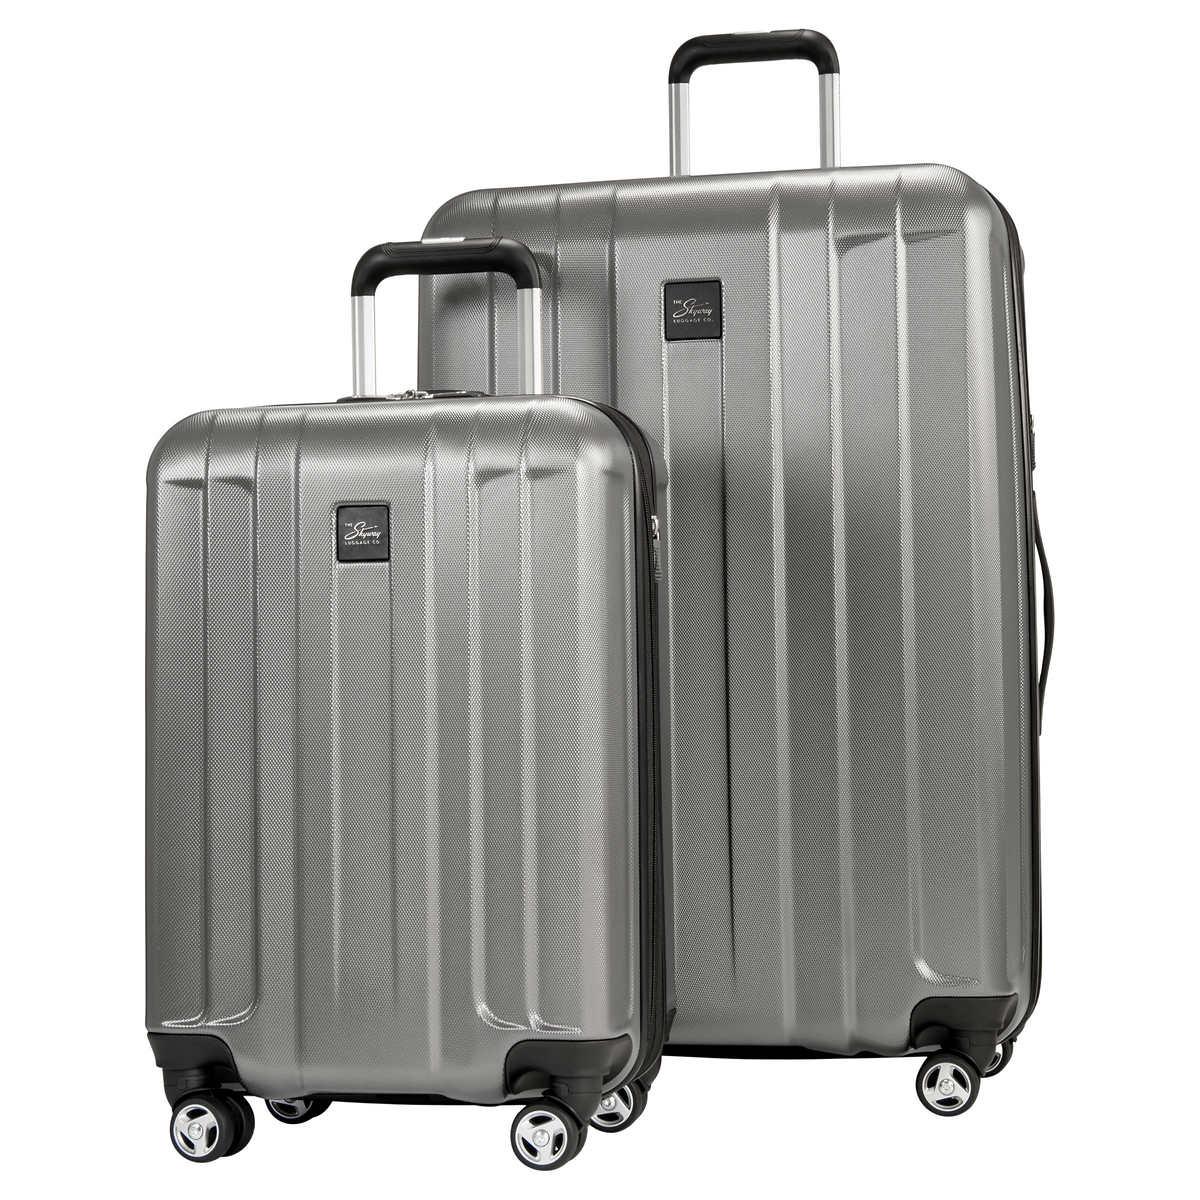 c313ea4c2 Skyway Whittier 2-Piece Expandable Hardside Spinner Luggage Set